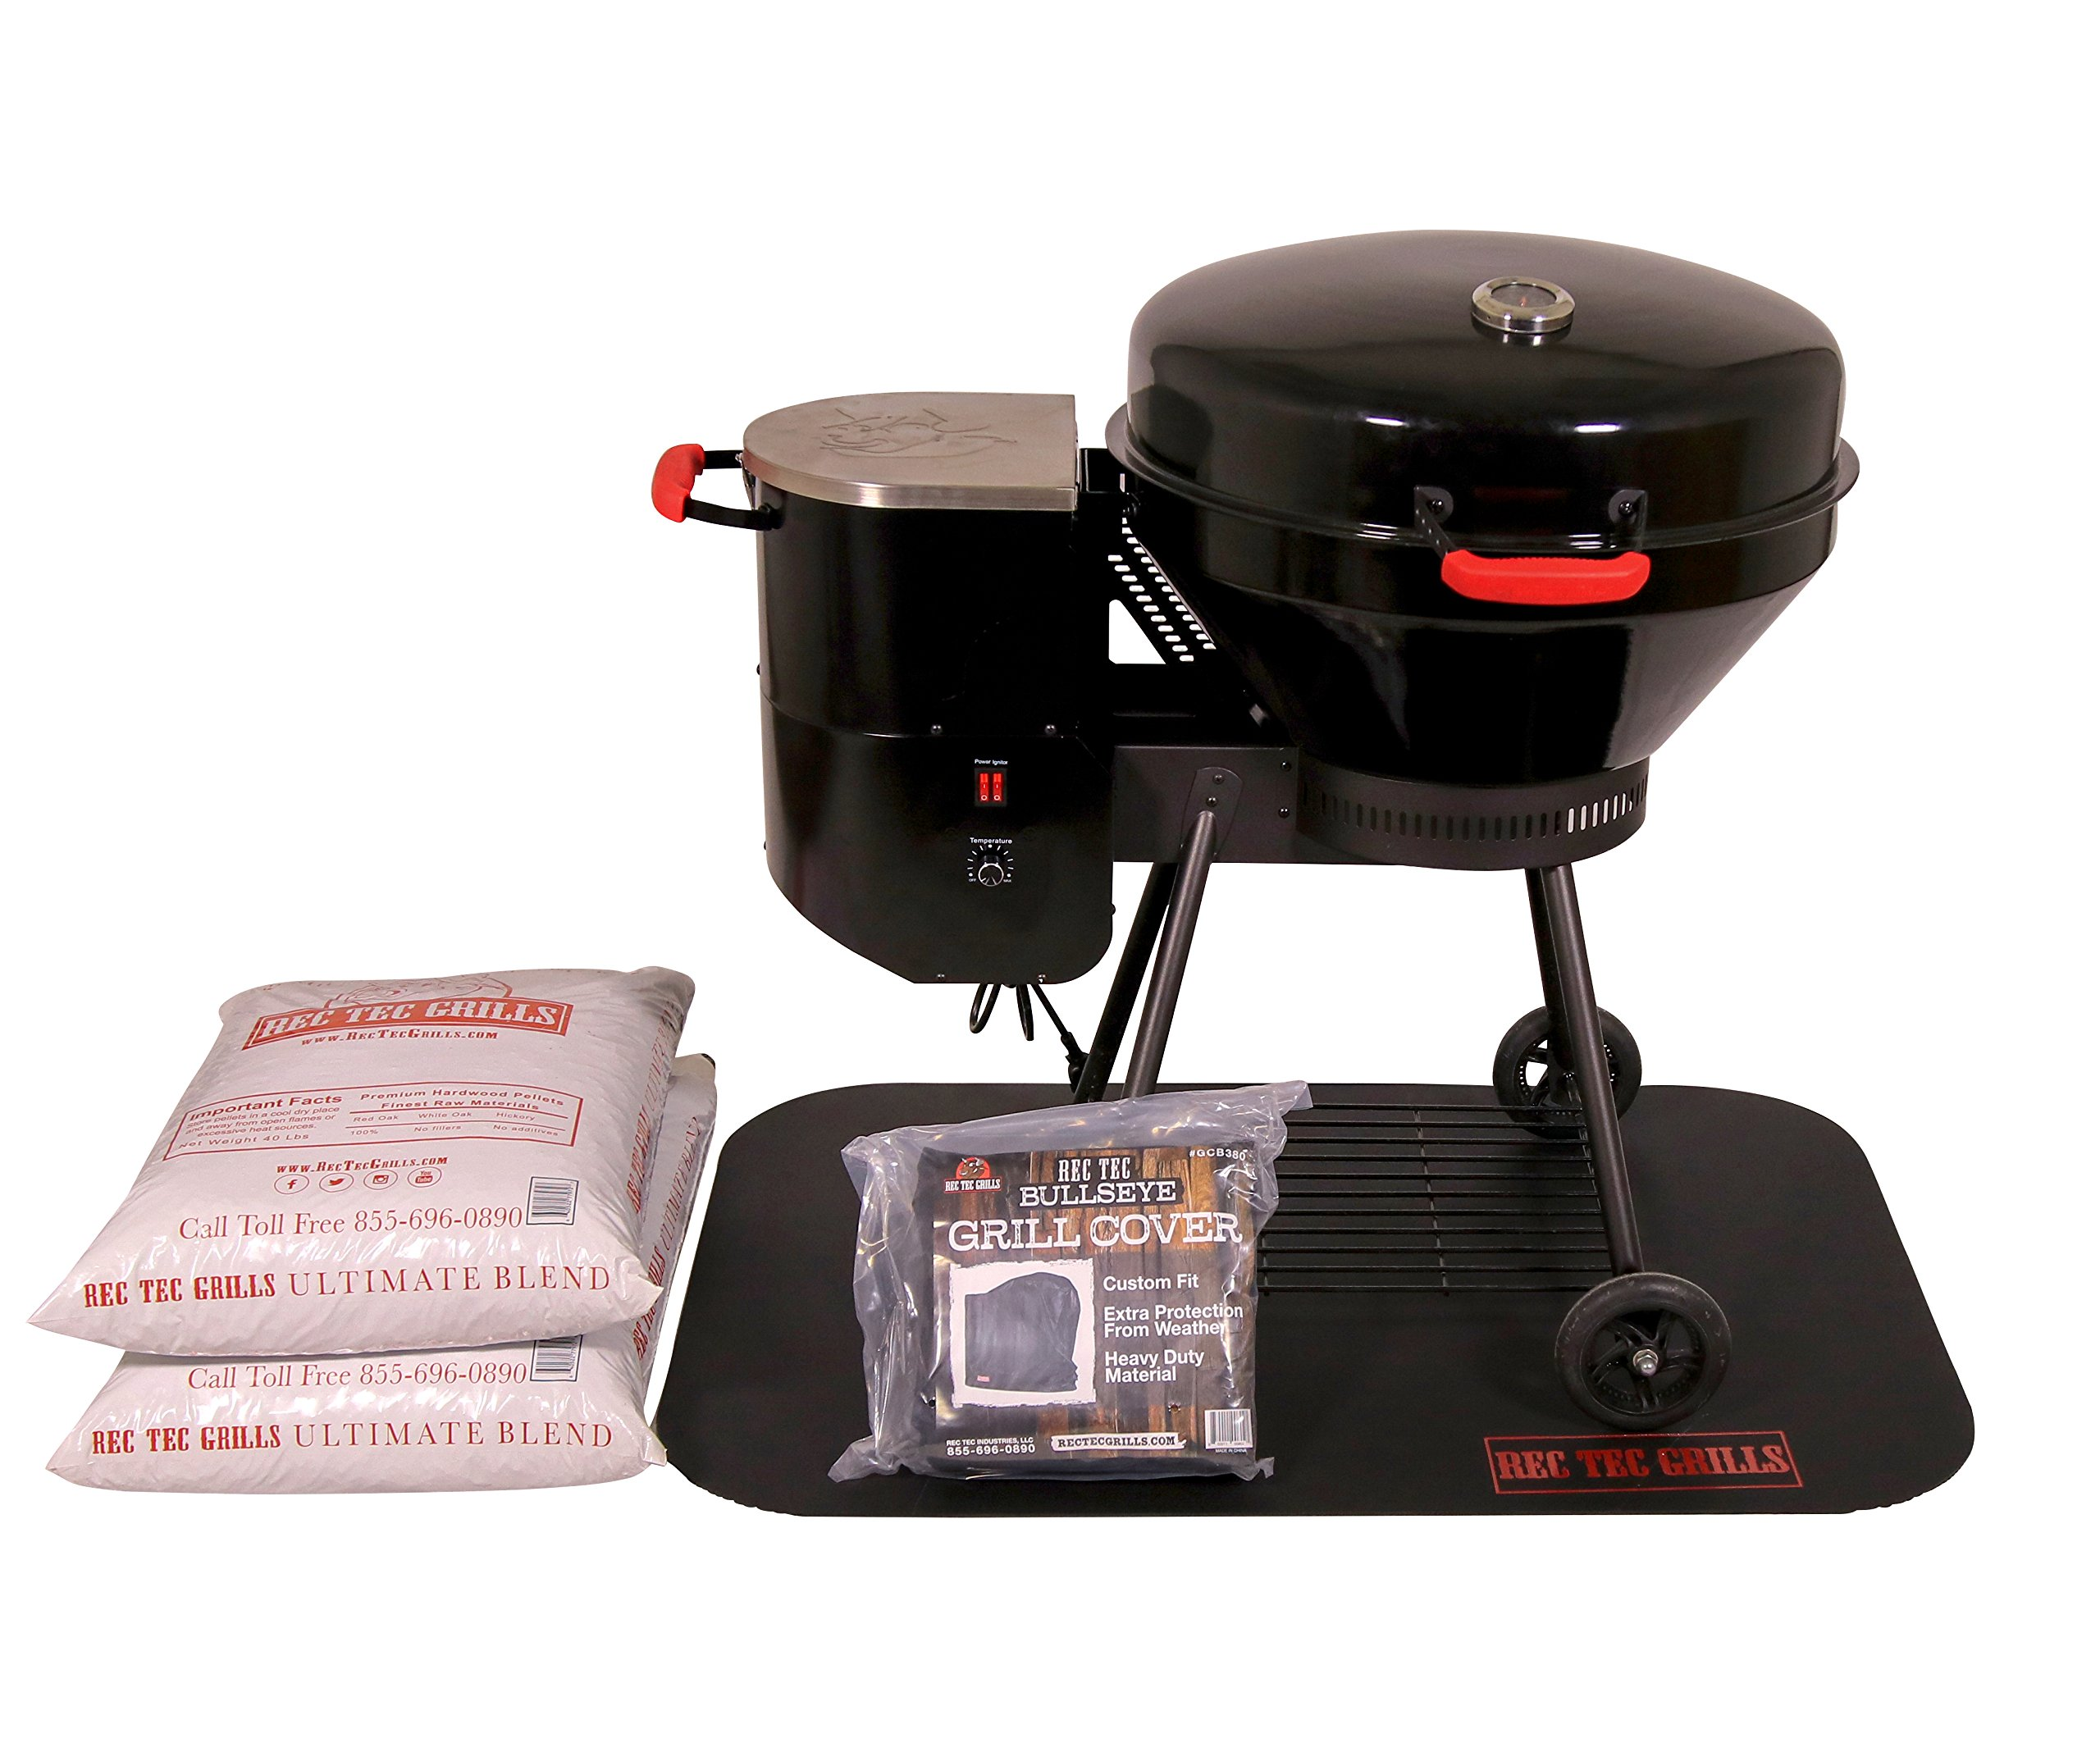 REC TEC Grills Bullseye | RT-B380 | Bundle | Wood Pellet Grill | 15lb Hopper | 2 Year Warranty | Hotflash Ceramic Ignition System by REC TEC Grills (Image #1)